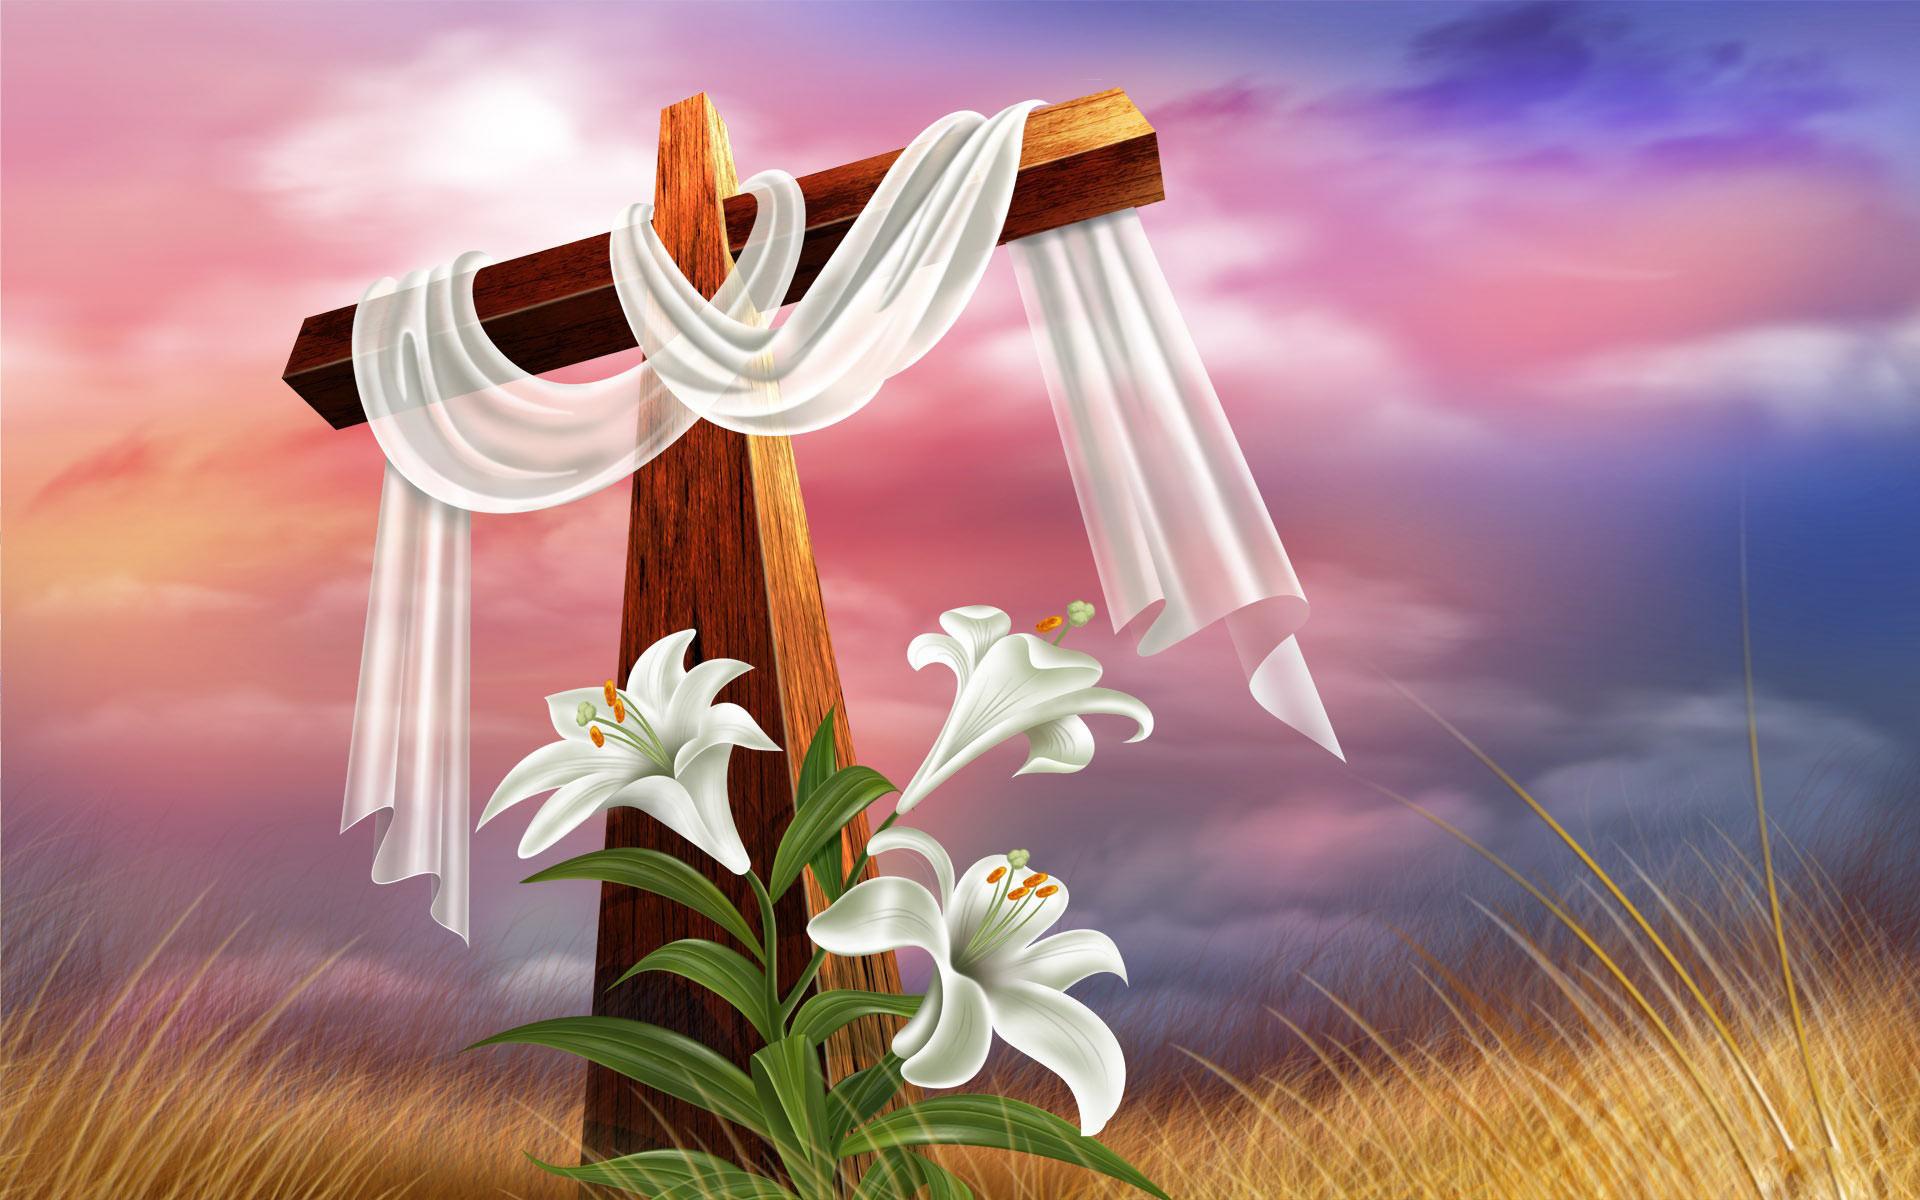 jesus christ widescreen wallpapers - photo #23